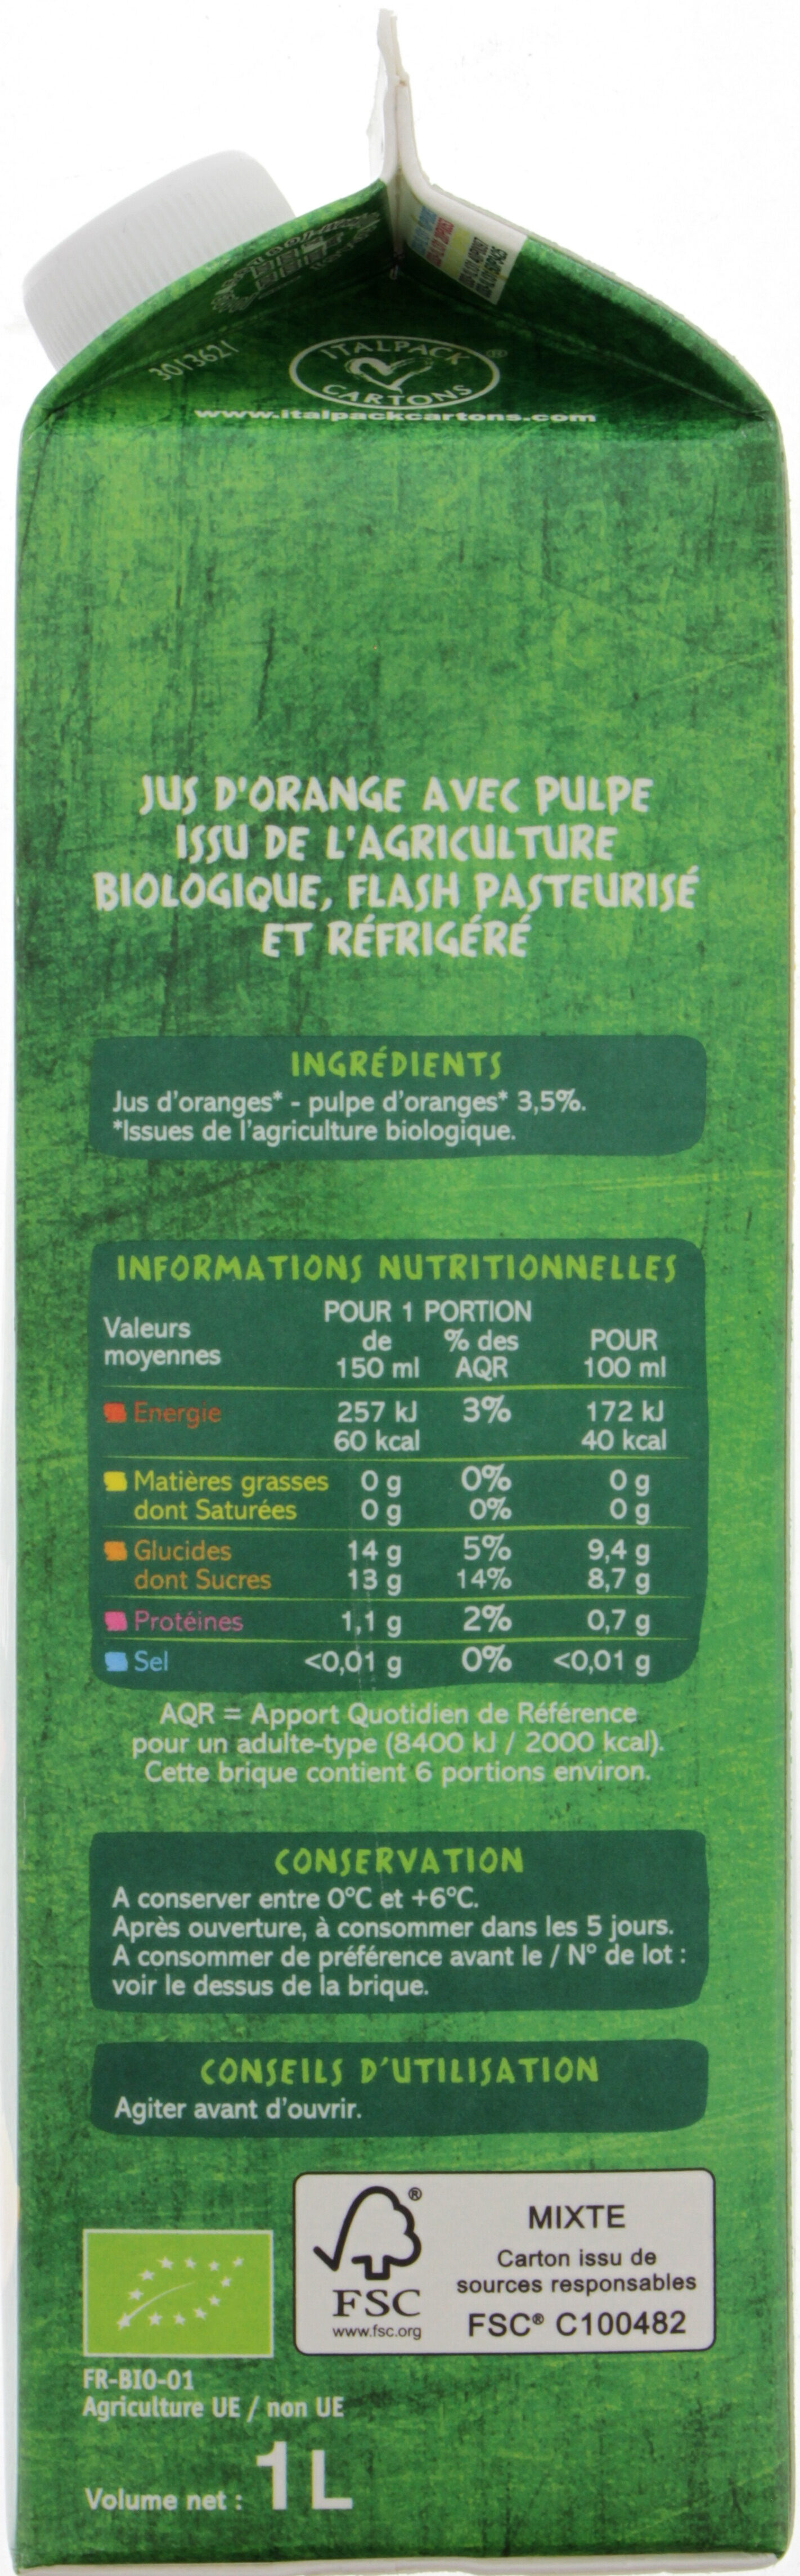 100% Pur Jus Orange BIO réfrigéré - Voedingswaarden